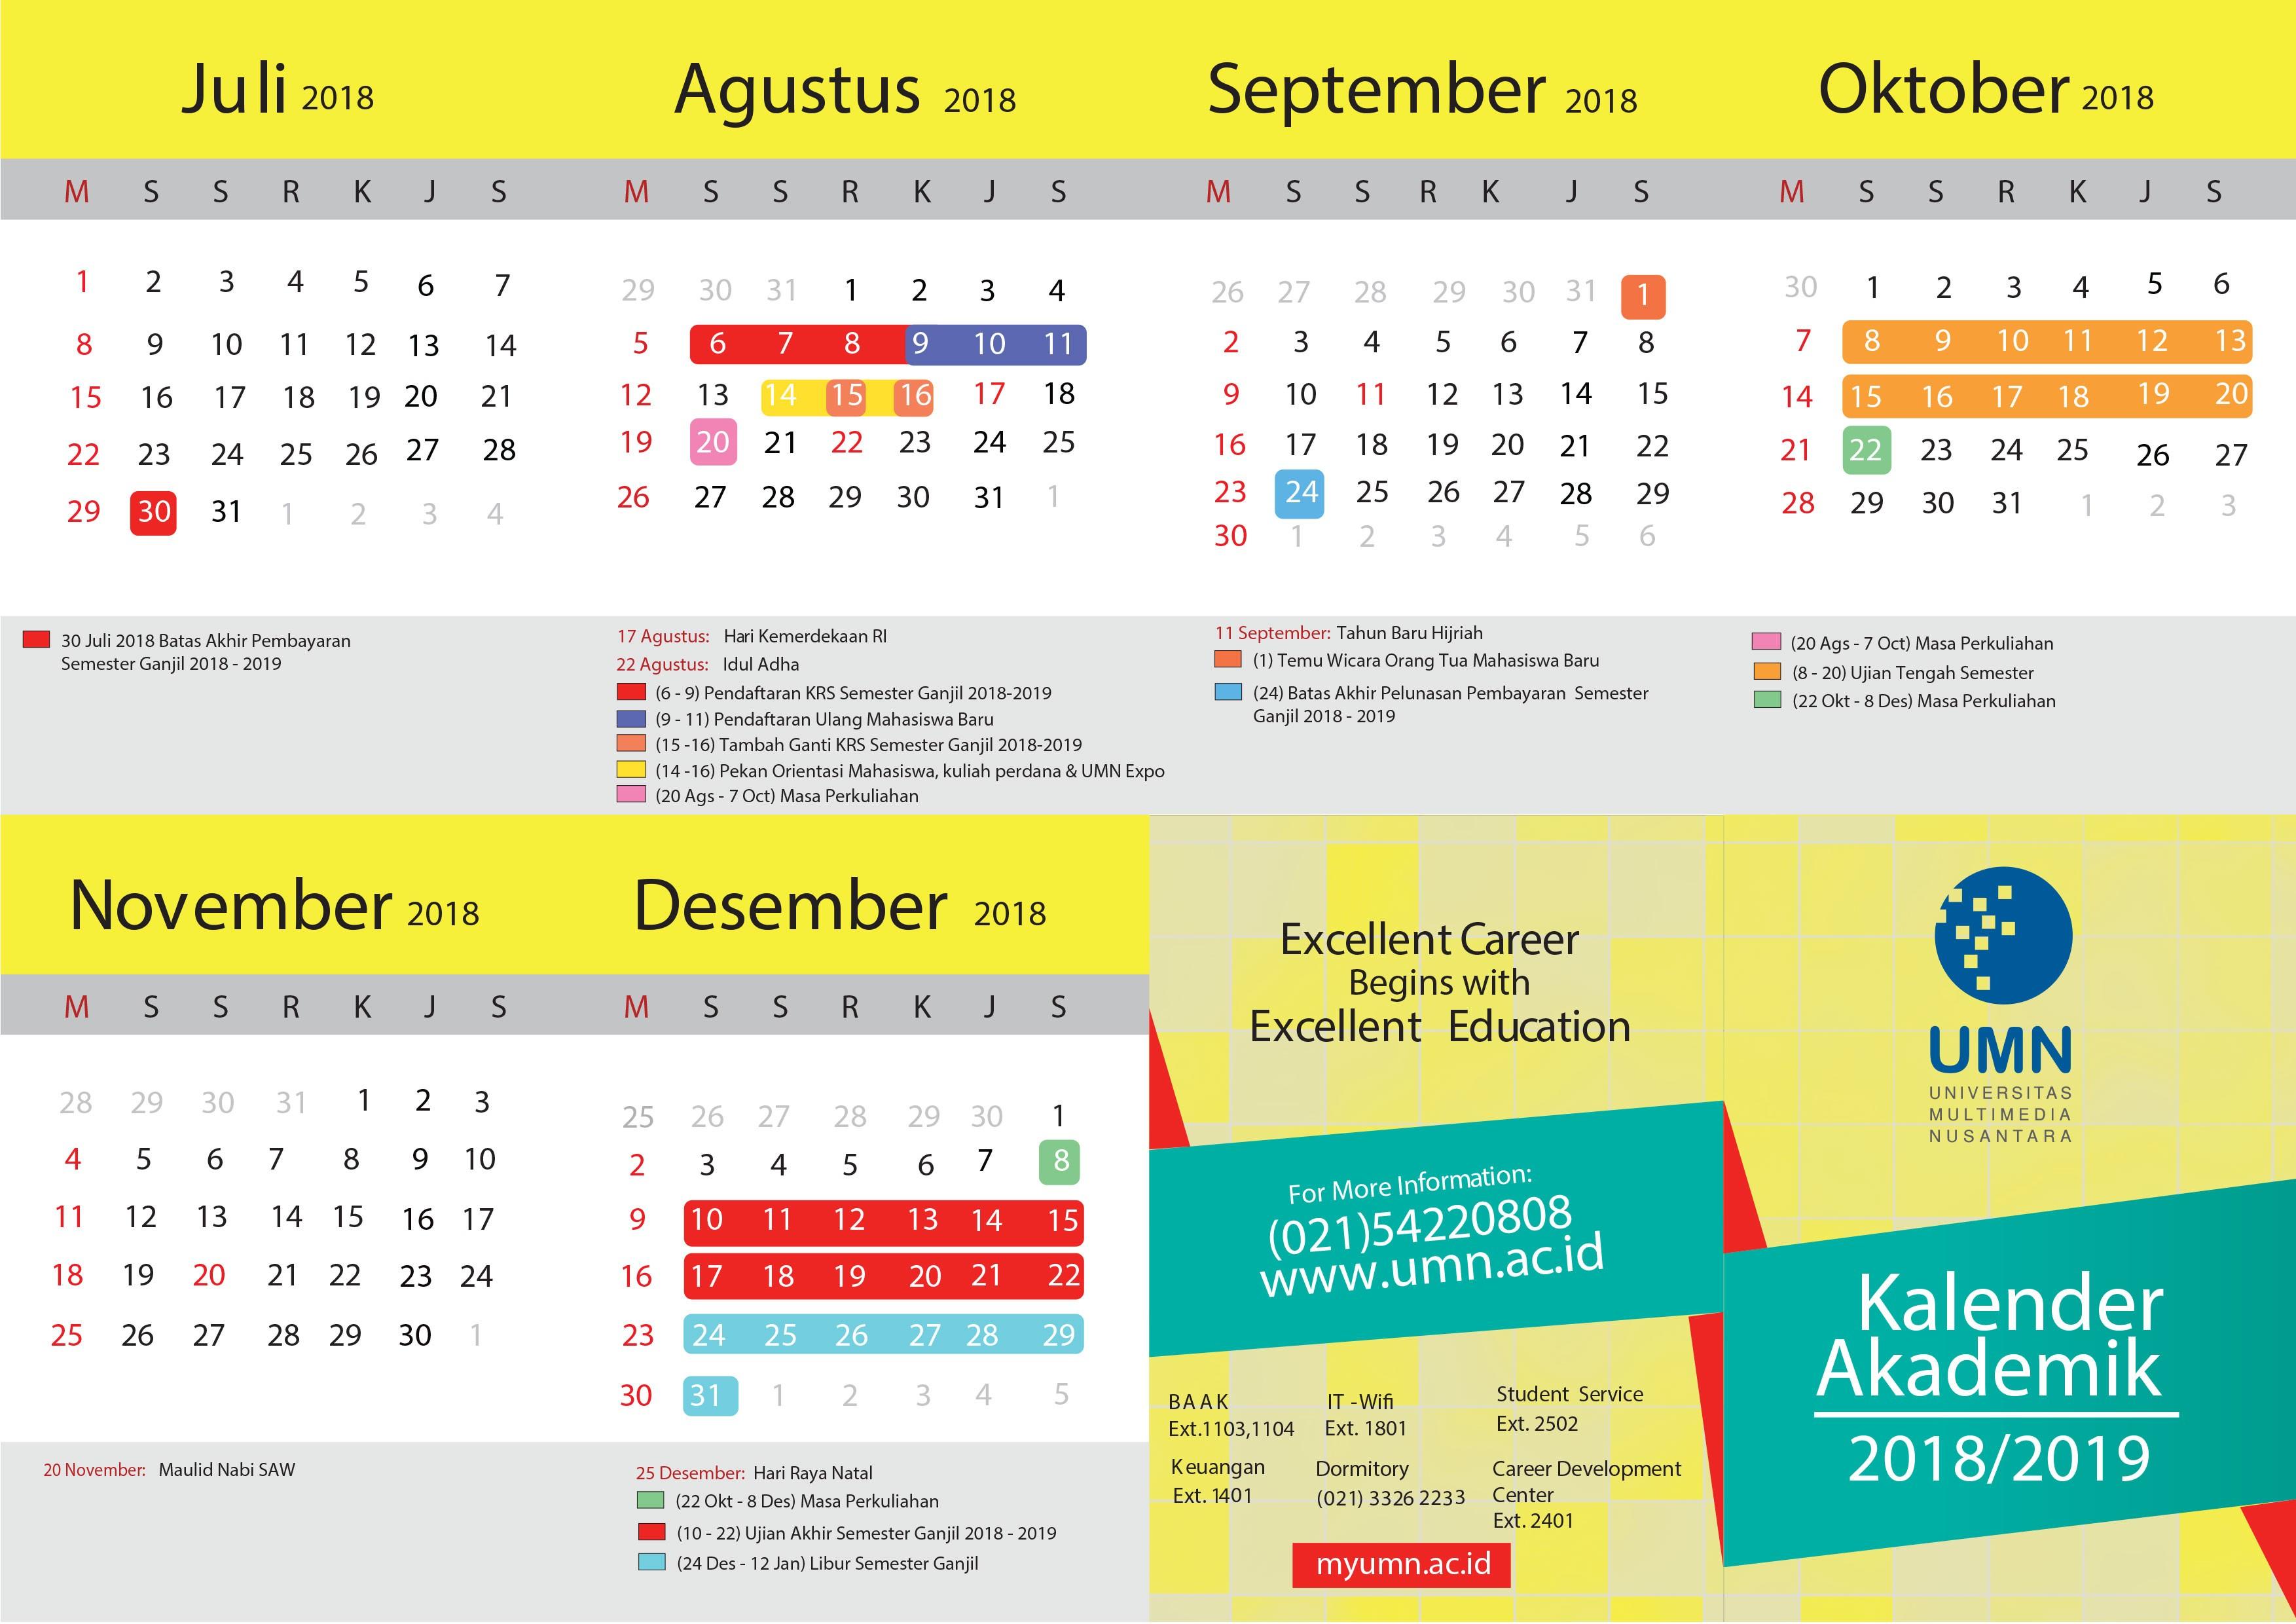 awesome kalender with kalender